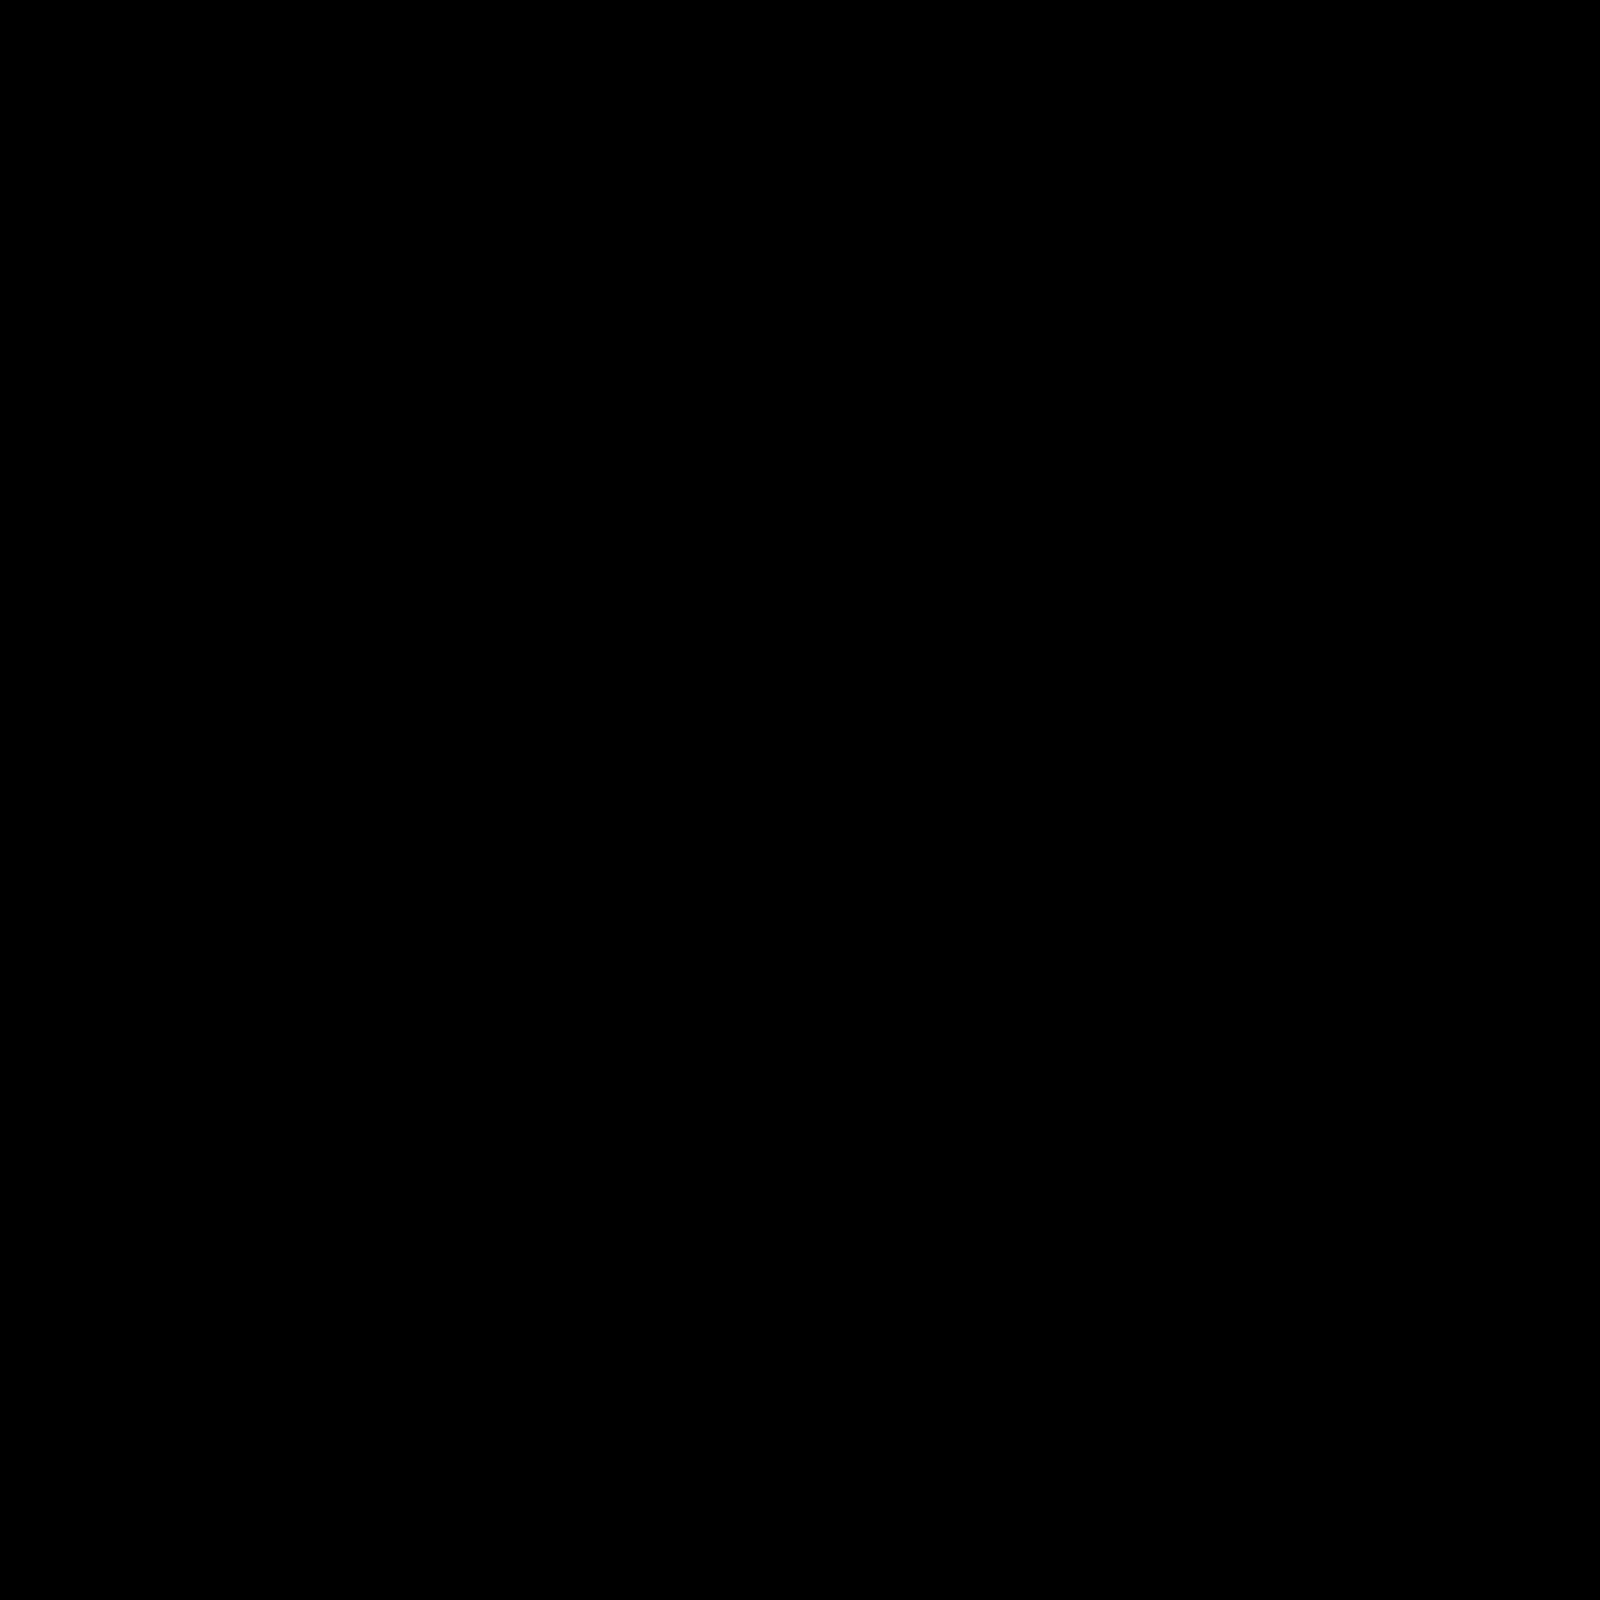 Unsplash icon